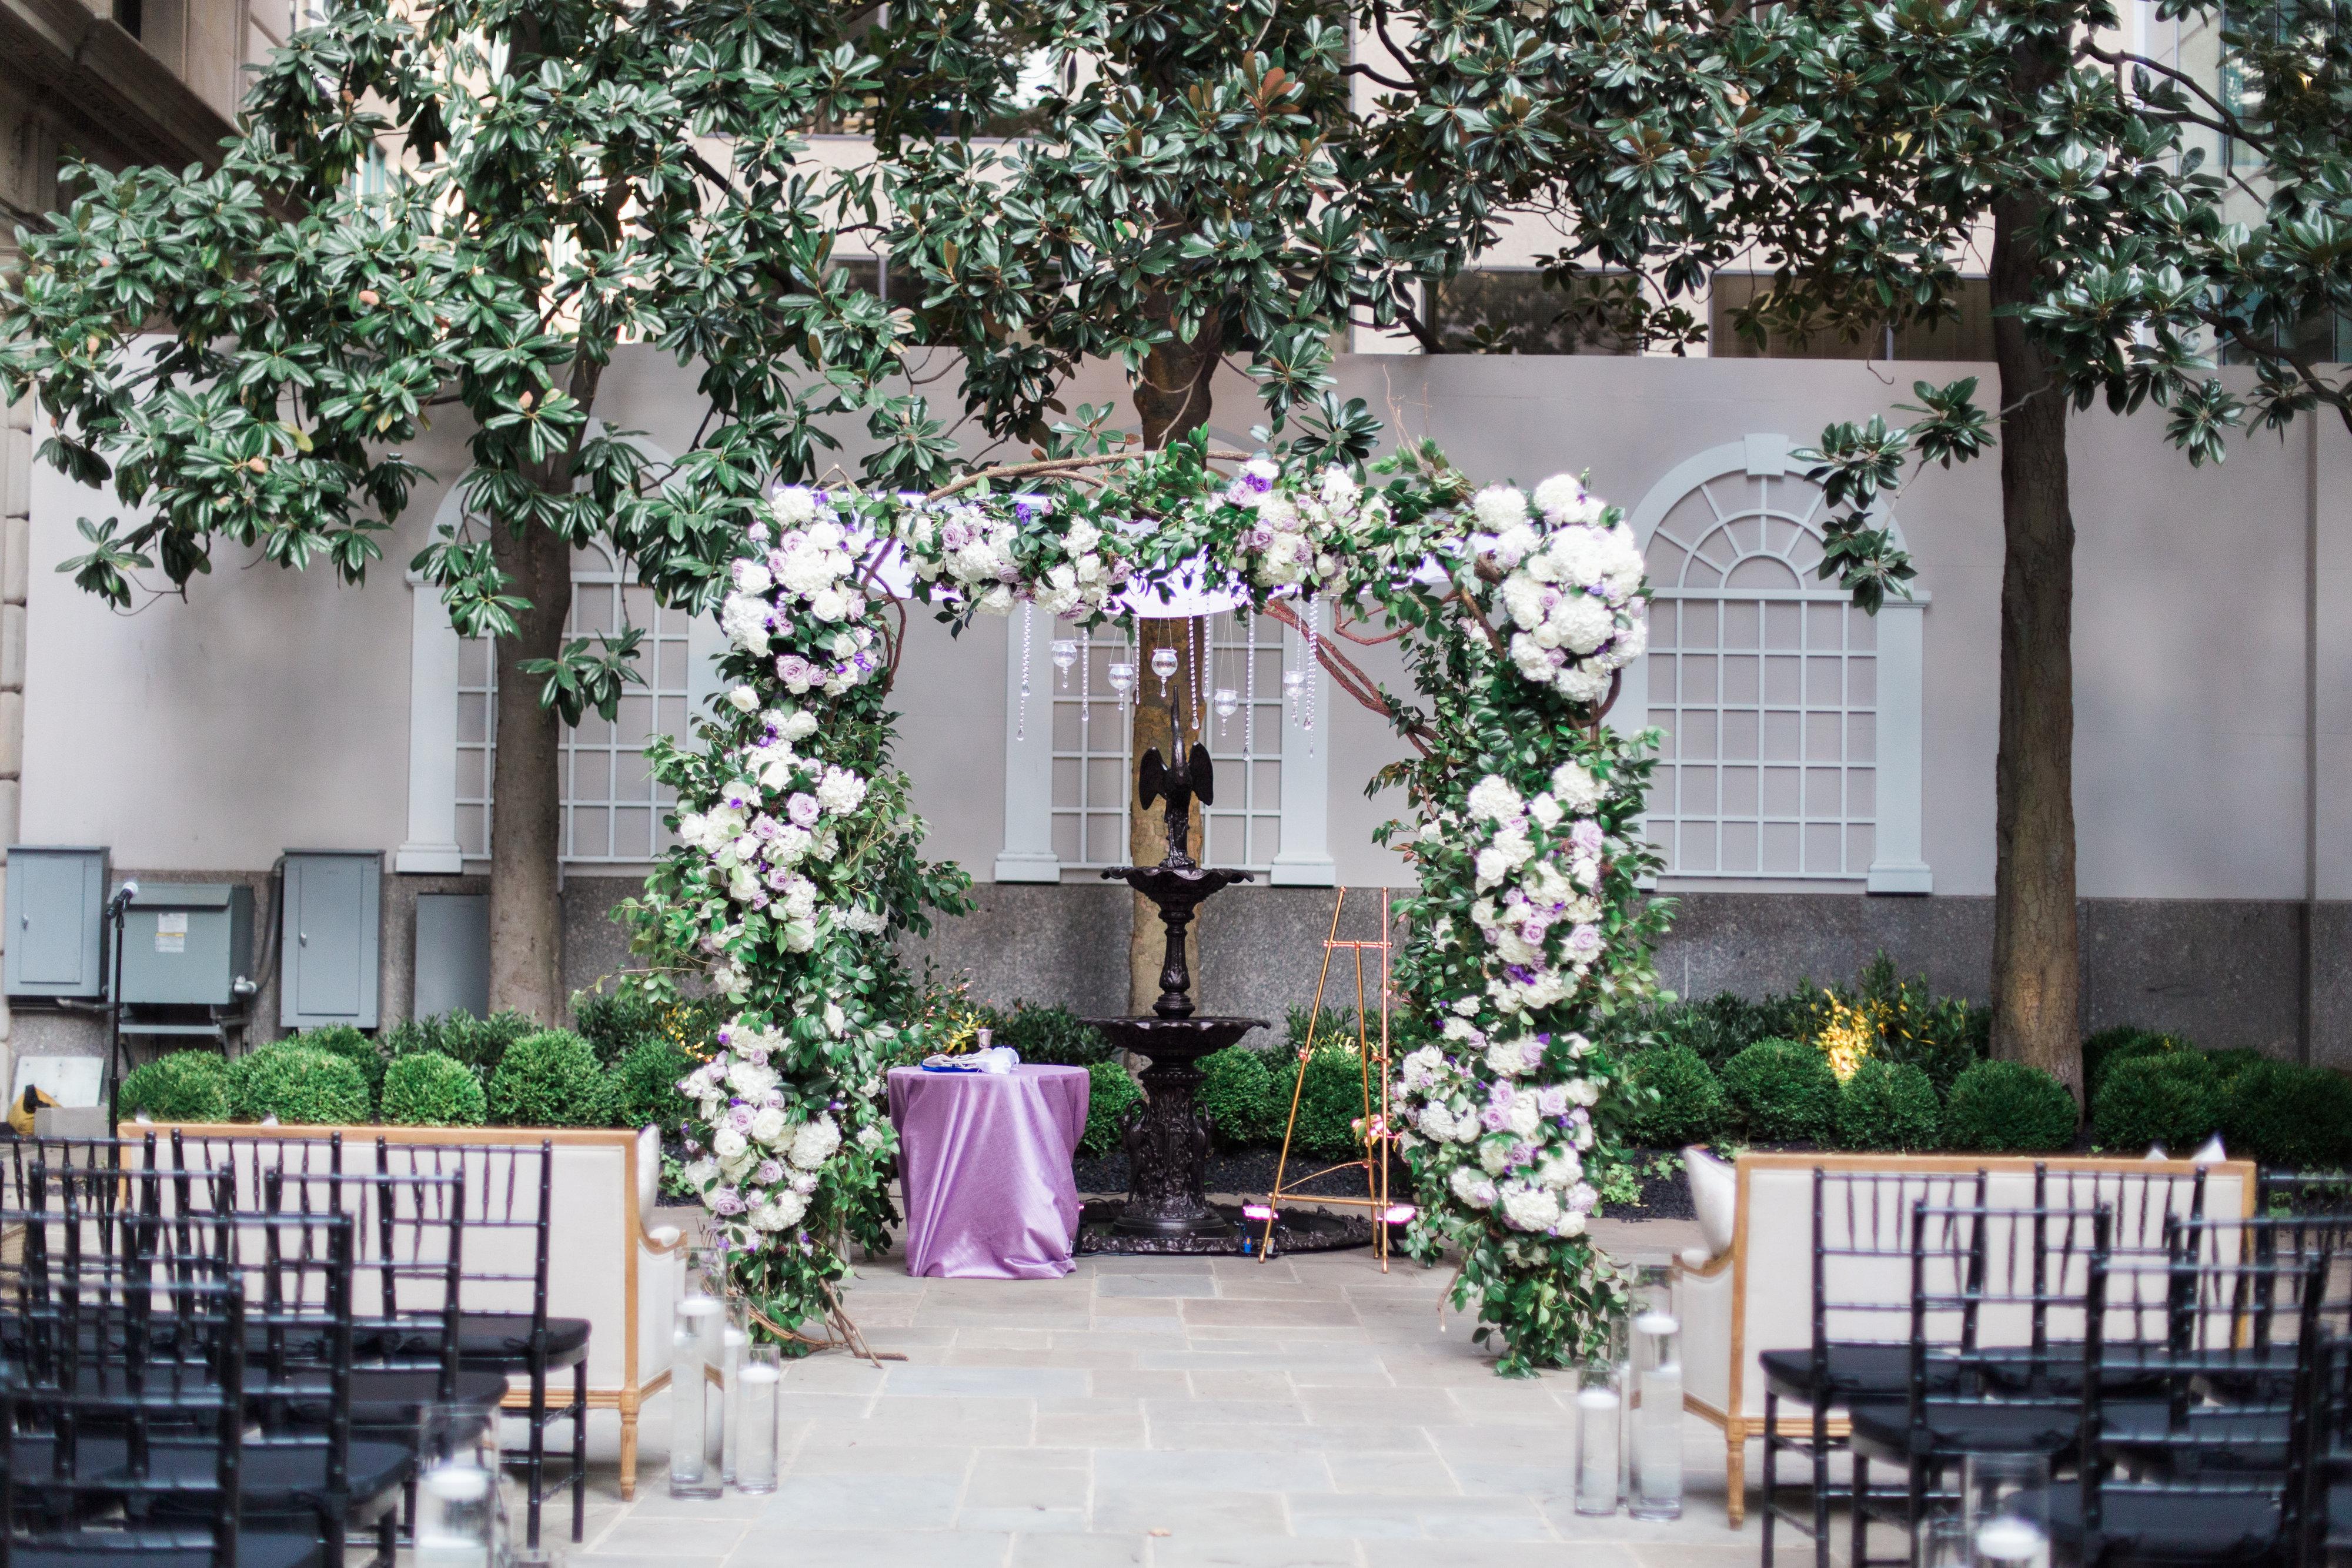 St Regis Washington Wedding, DC Wedding Planner Bright Occasions, Sarah Bradshaw Photography